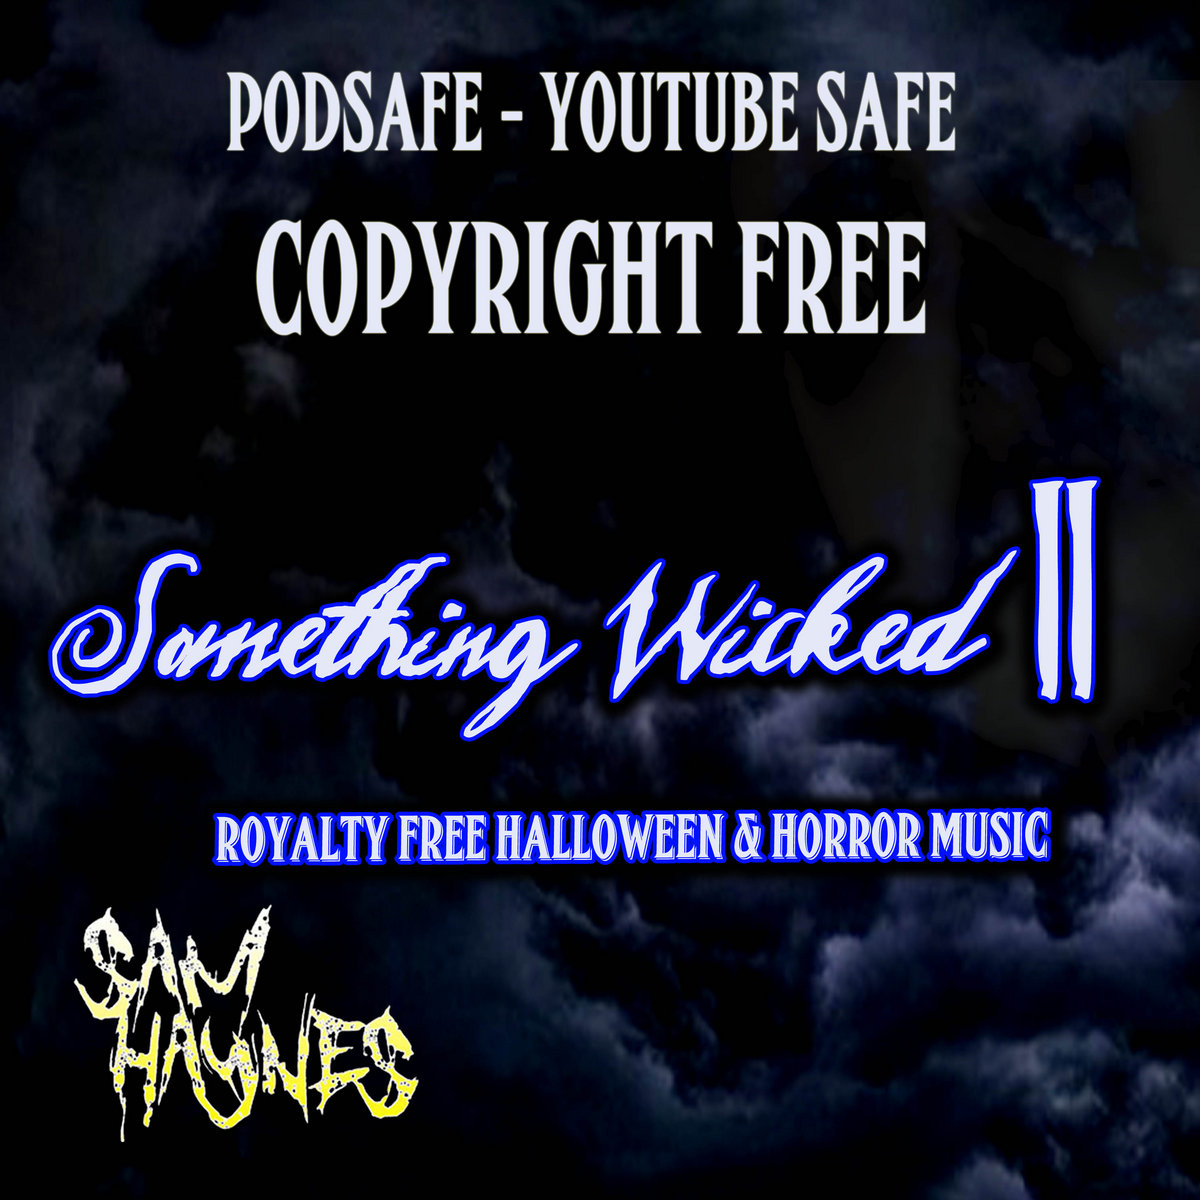 FREE HALLOWEEN MUSIC CD - Something Wicked 2 - Royalty Free ...